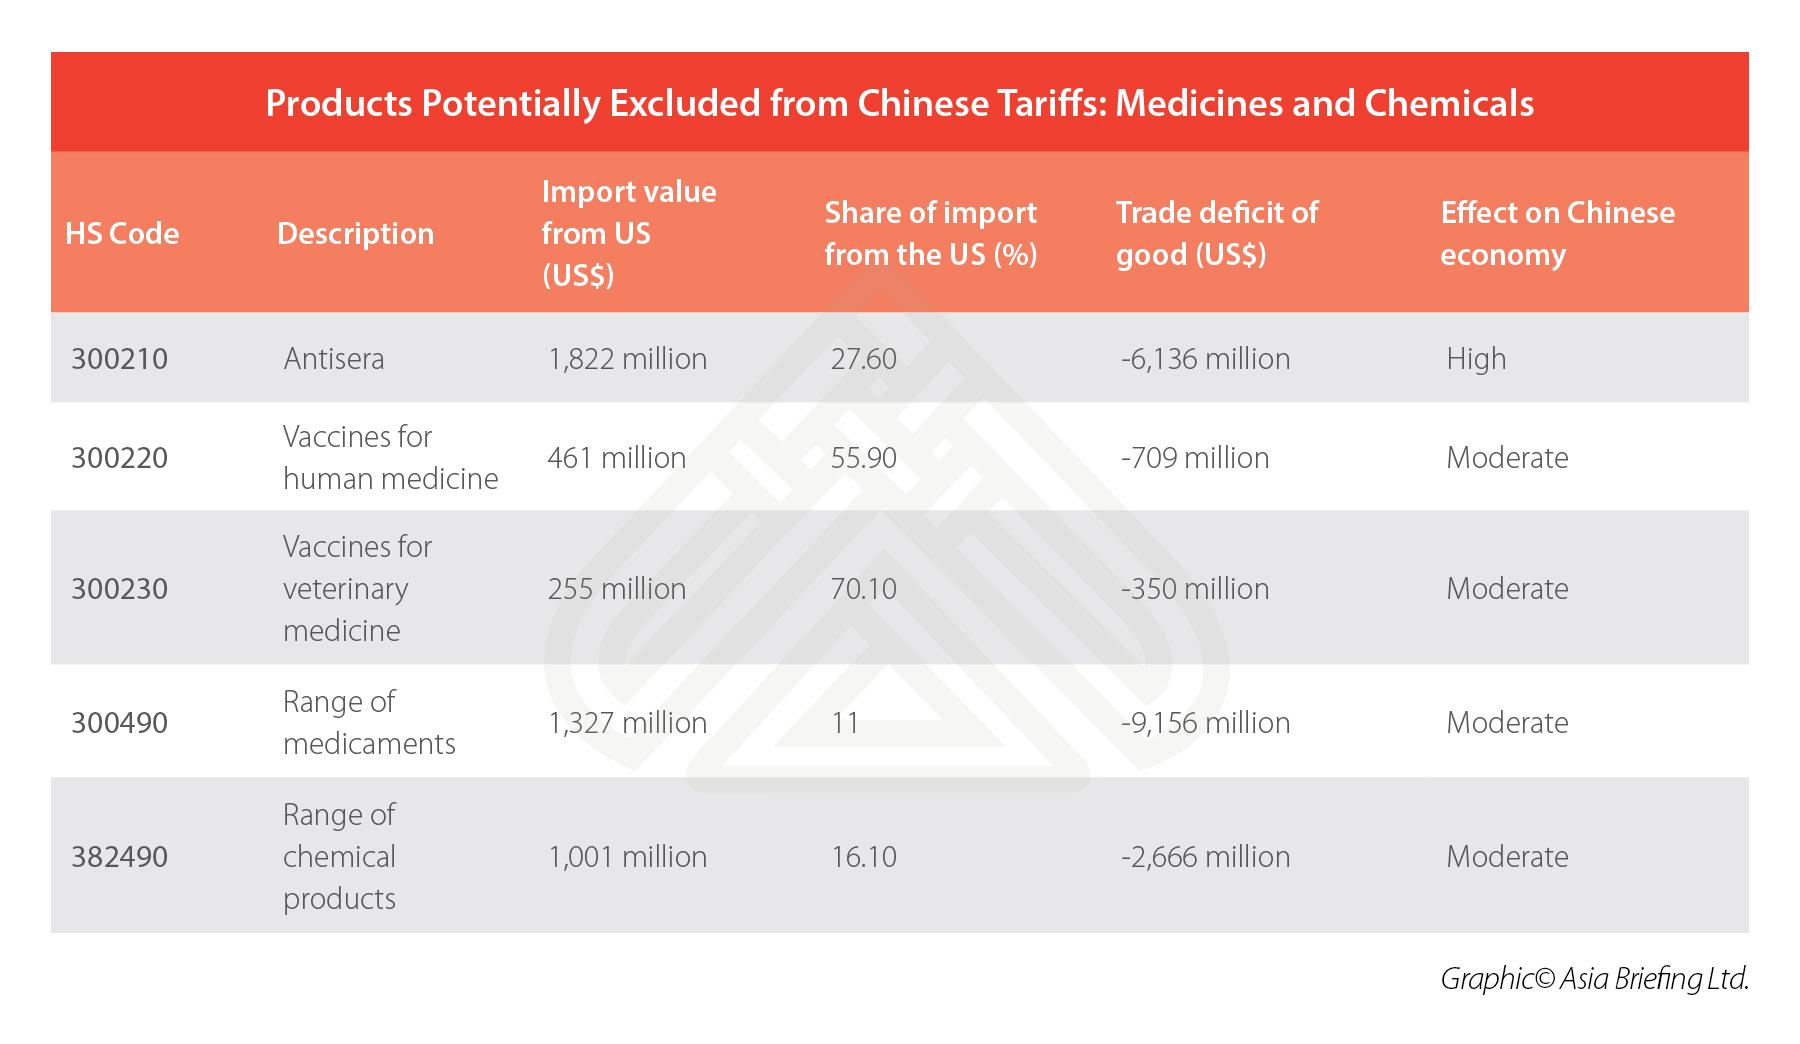 china-medicines-chemicals-imports-US-tariffs